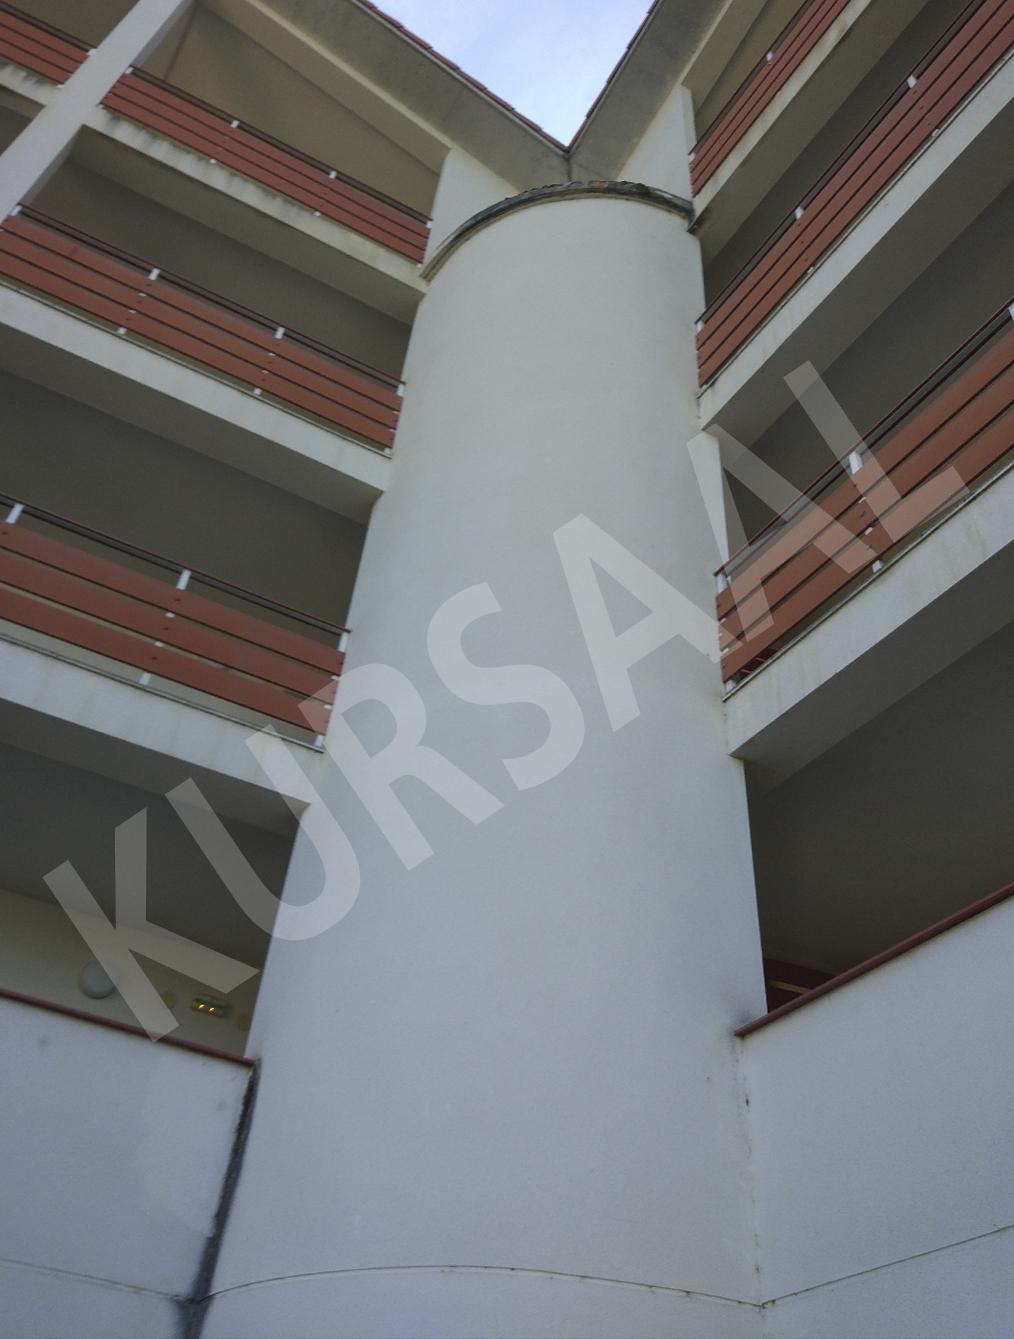 foto 13 - Aislamientos Térmicos y Eficiencia Energética-Amalkor 1-ADUNA- GIPUZKOA